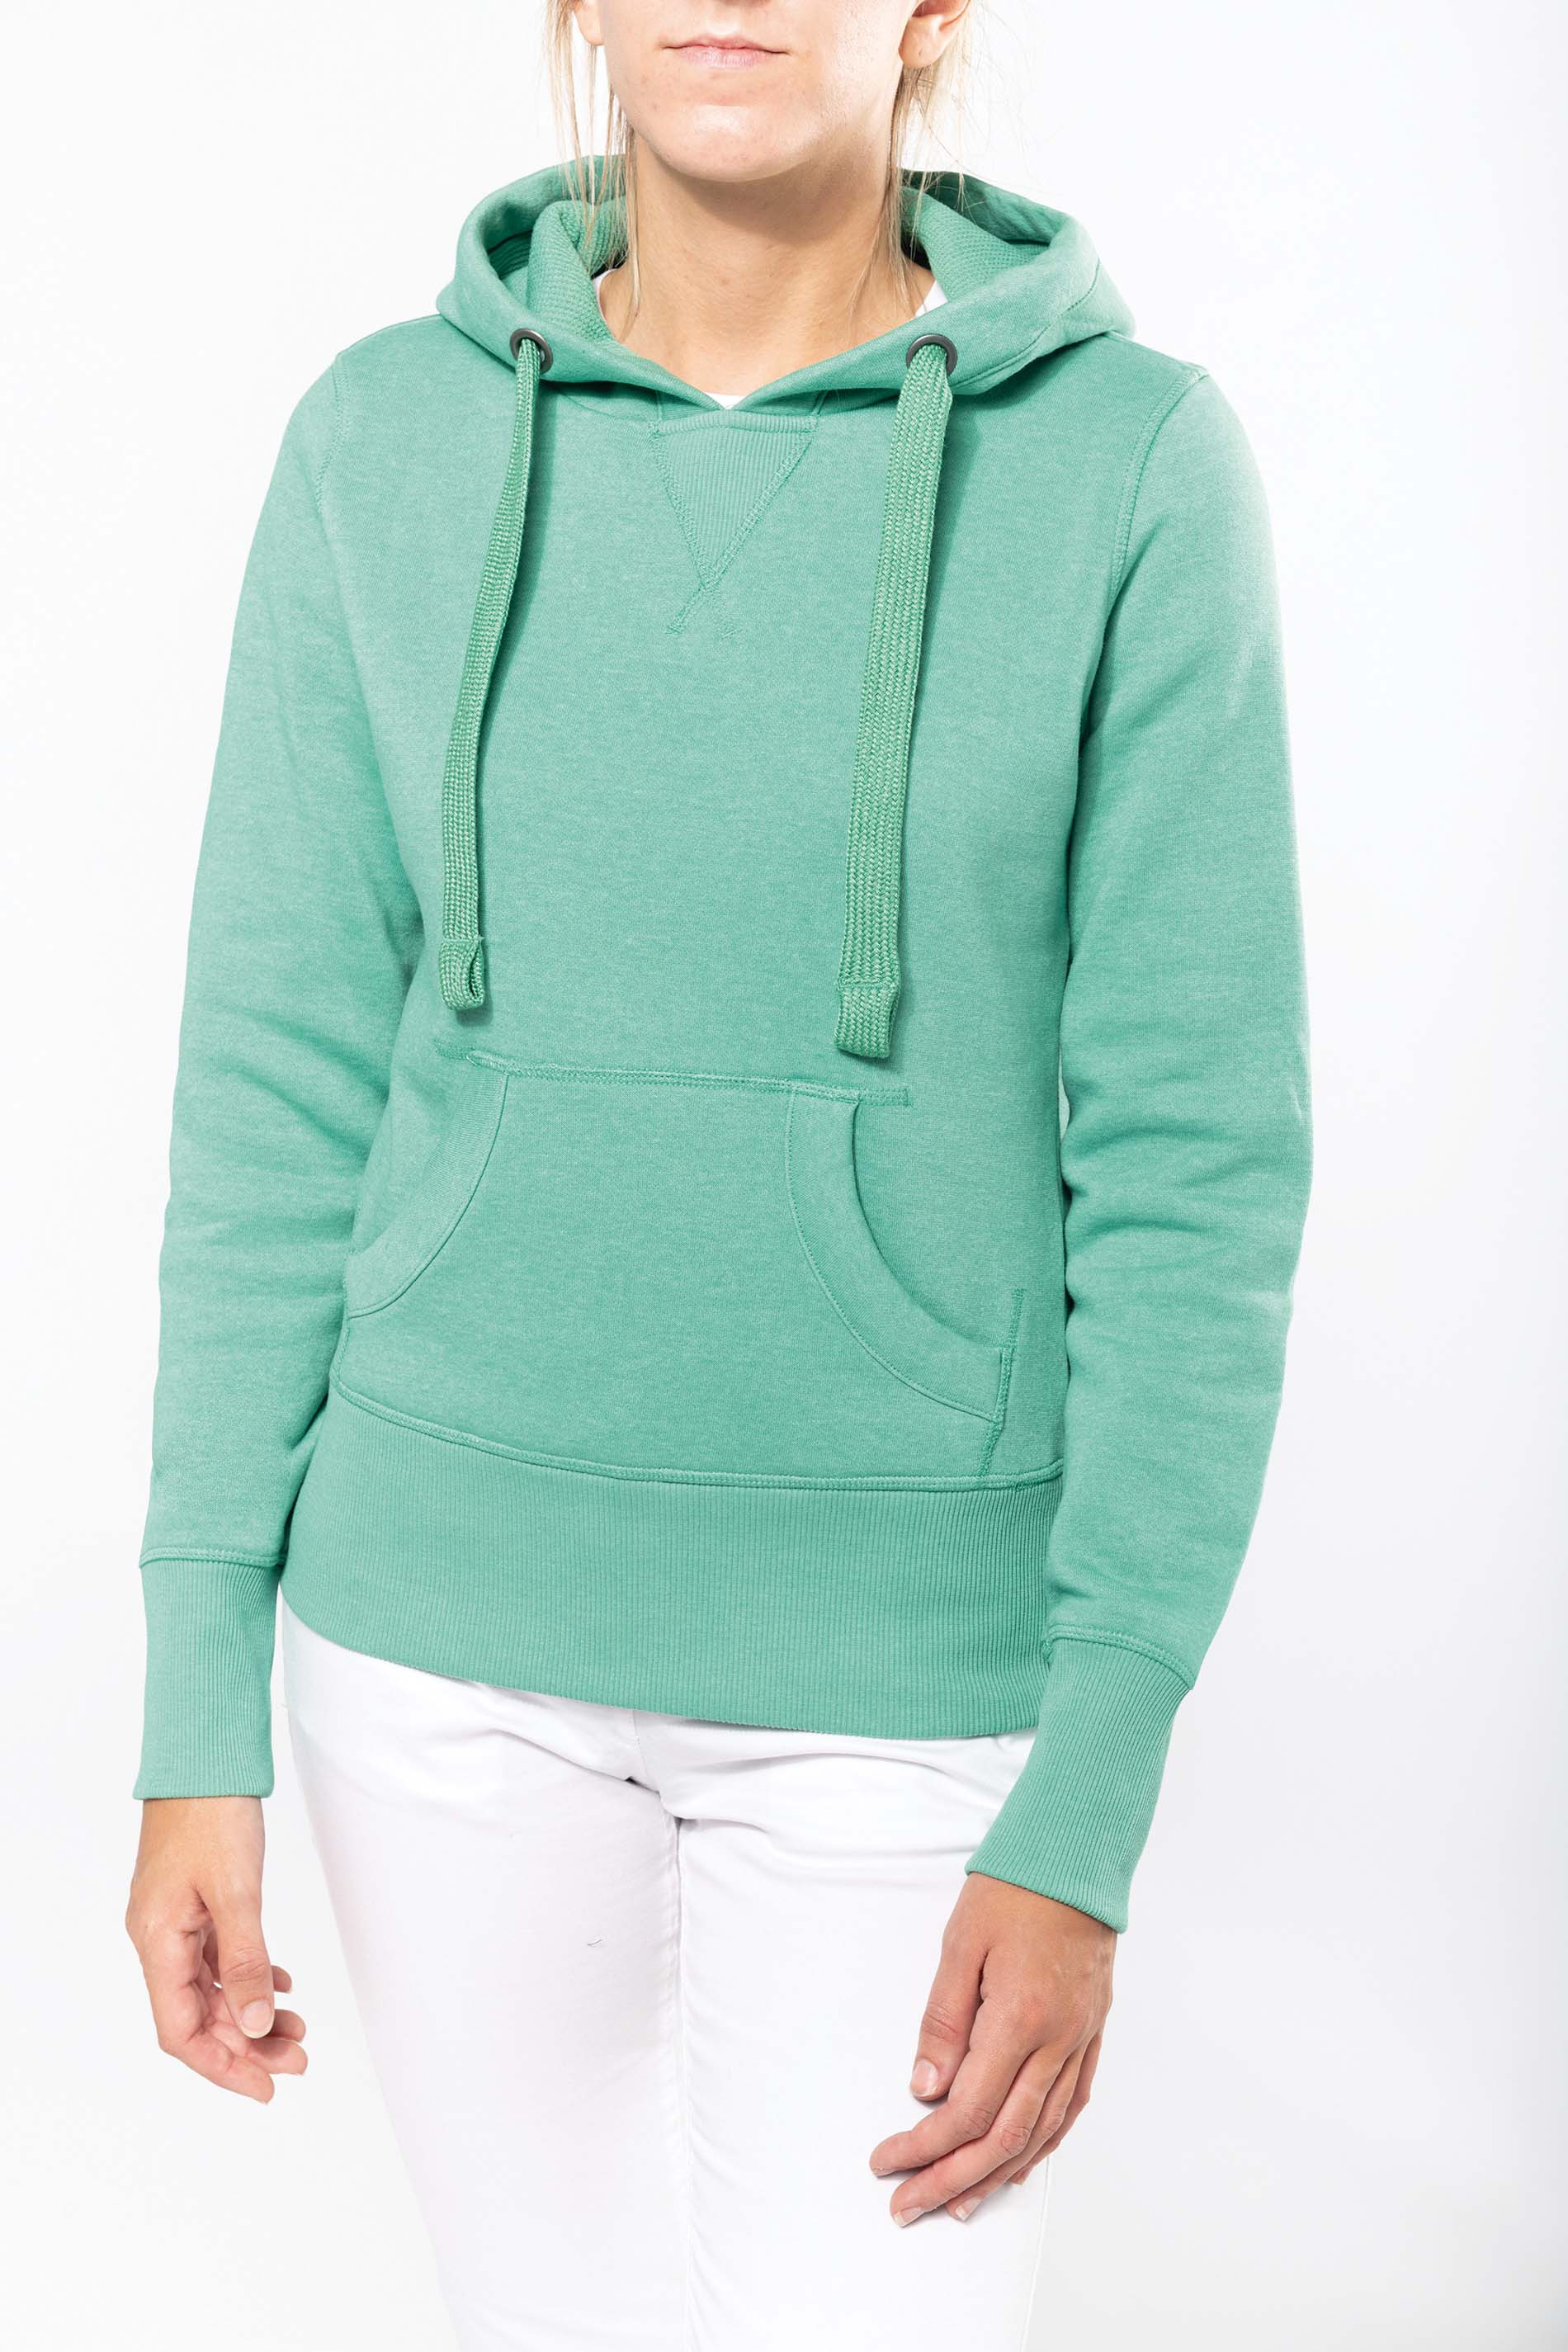 "Kariban Sweat-shirt capuche ""m�lange"" femme"